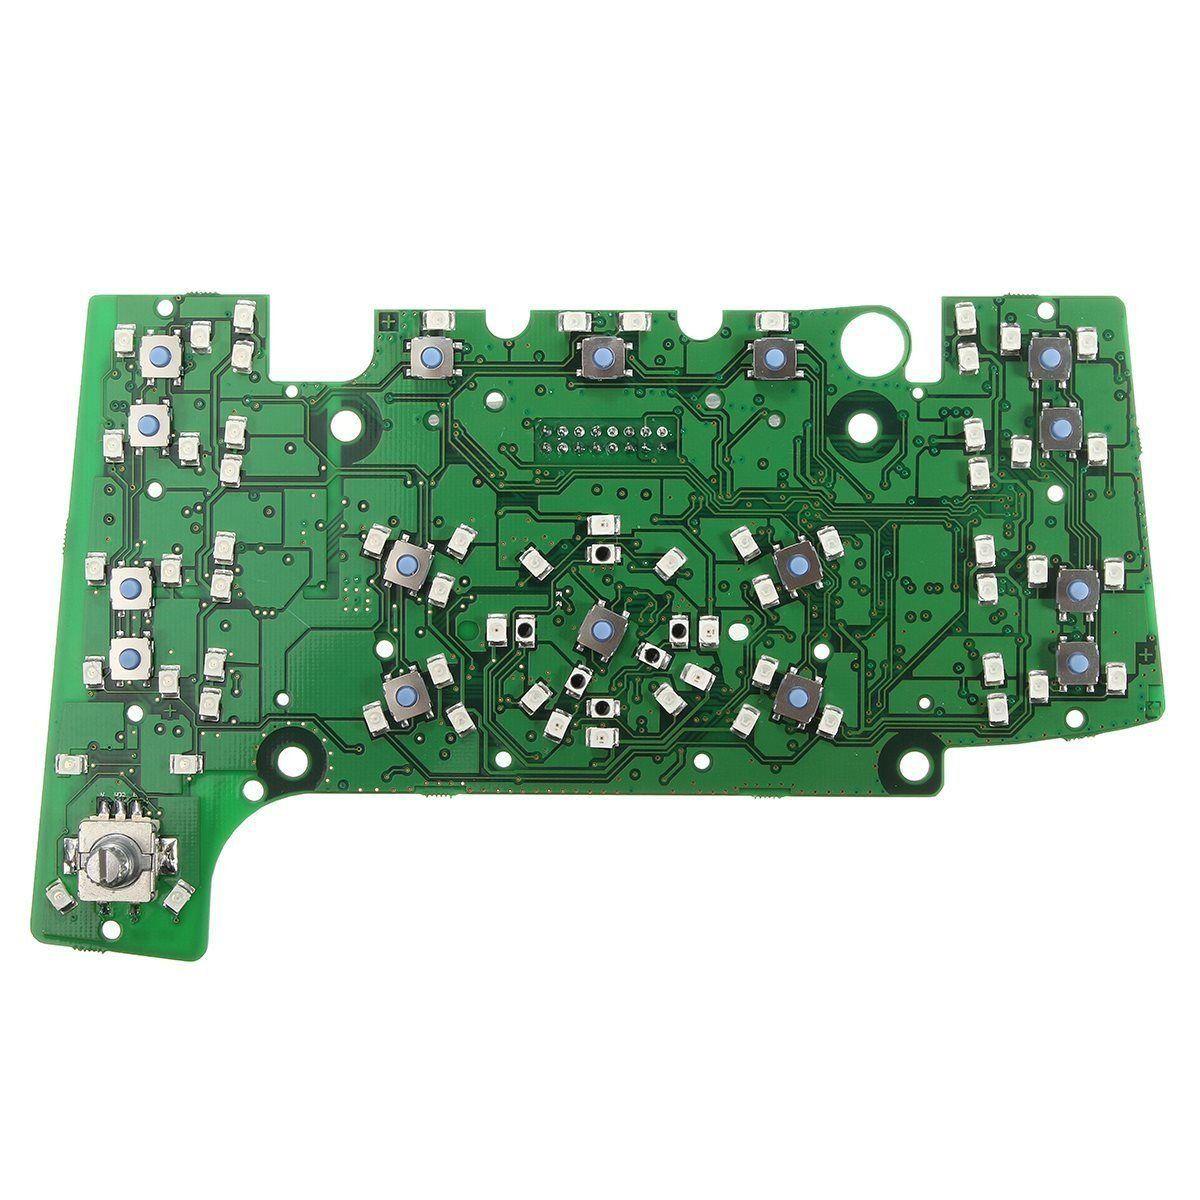 1Pcs Multimedia MMI Control Panel Circuit GPS Board W/Navigation For AUDI  A6 A6L Q7